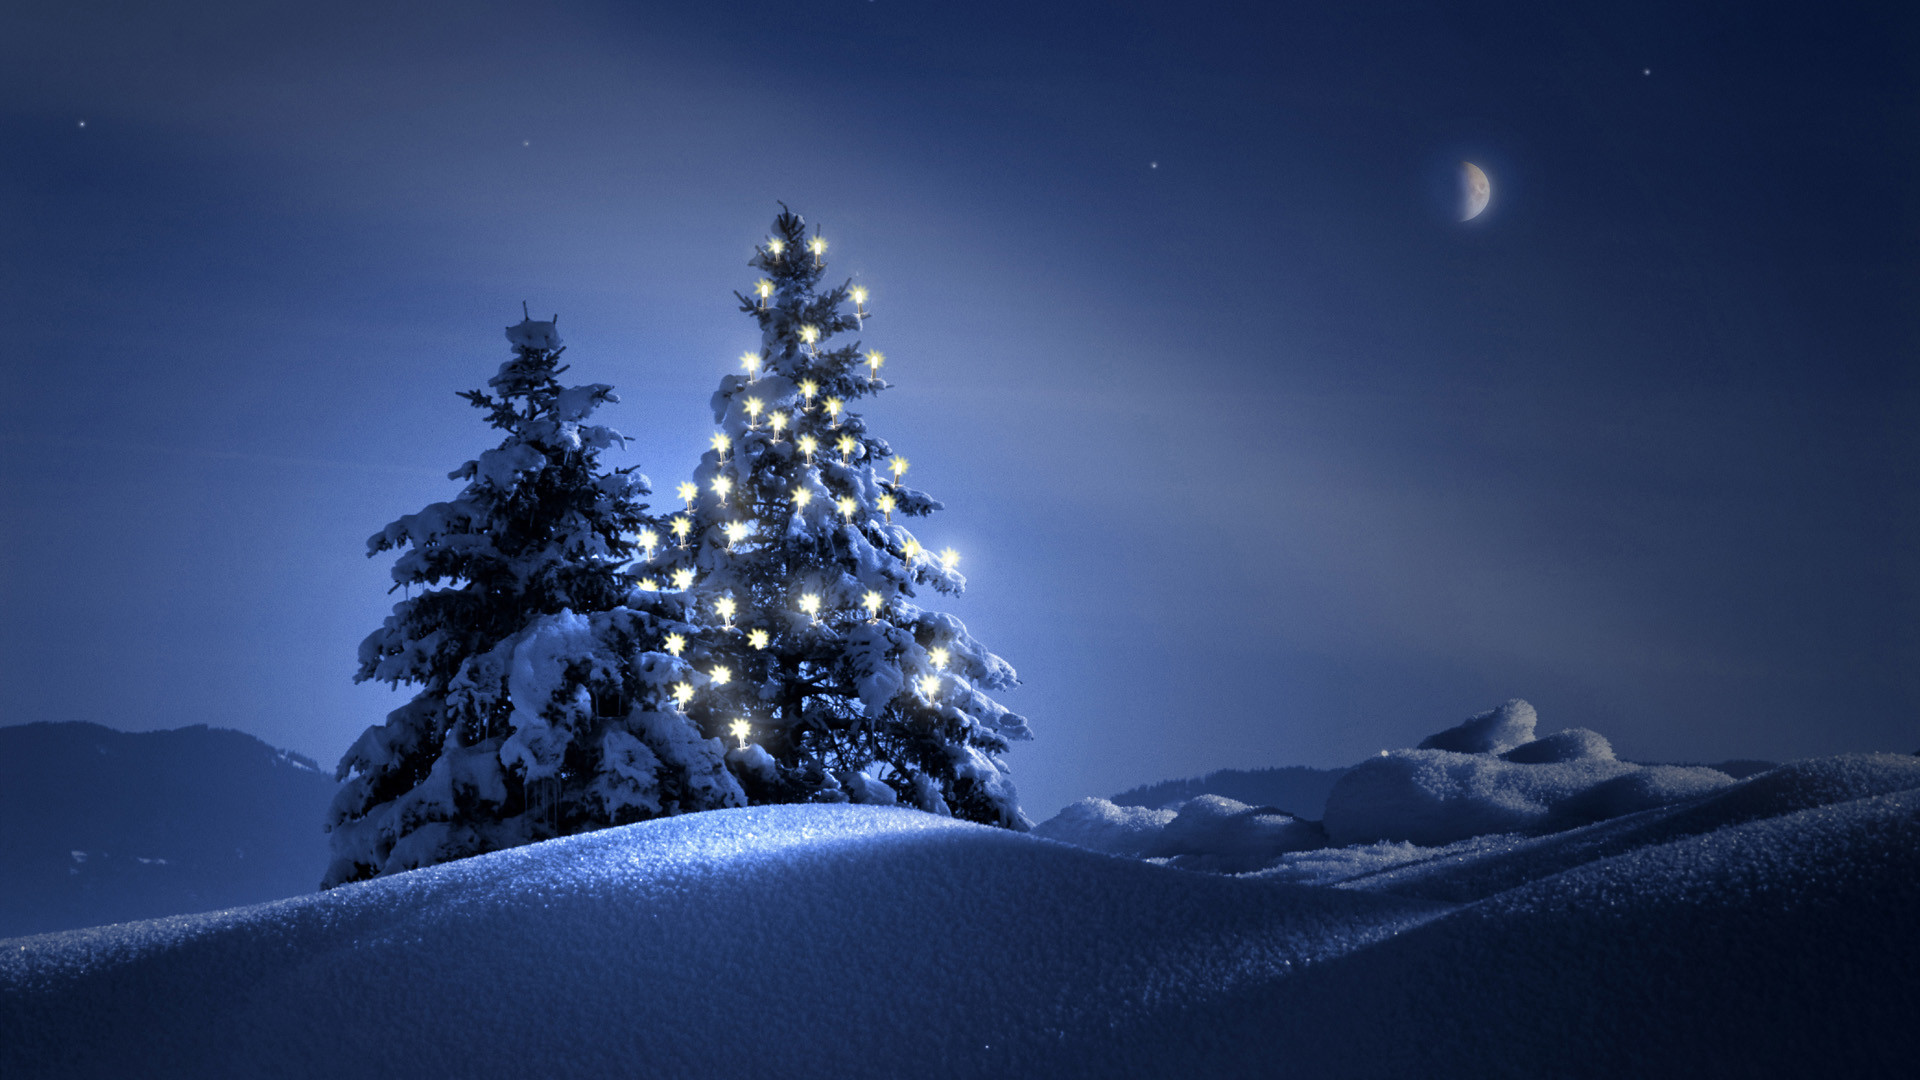 Moon Scenery Backgrounds | … the Heart Up, Very Impressive Scene – HD